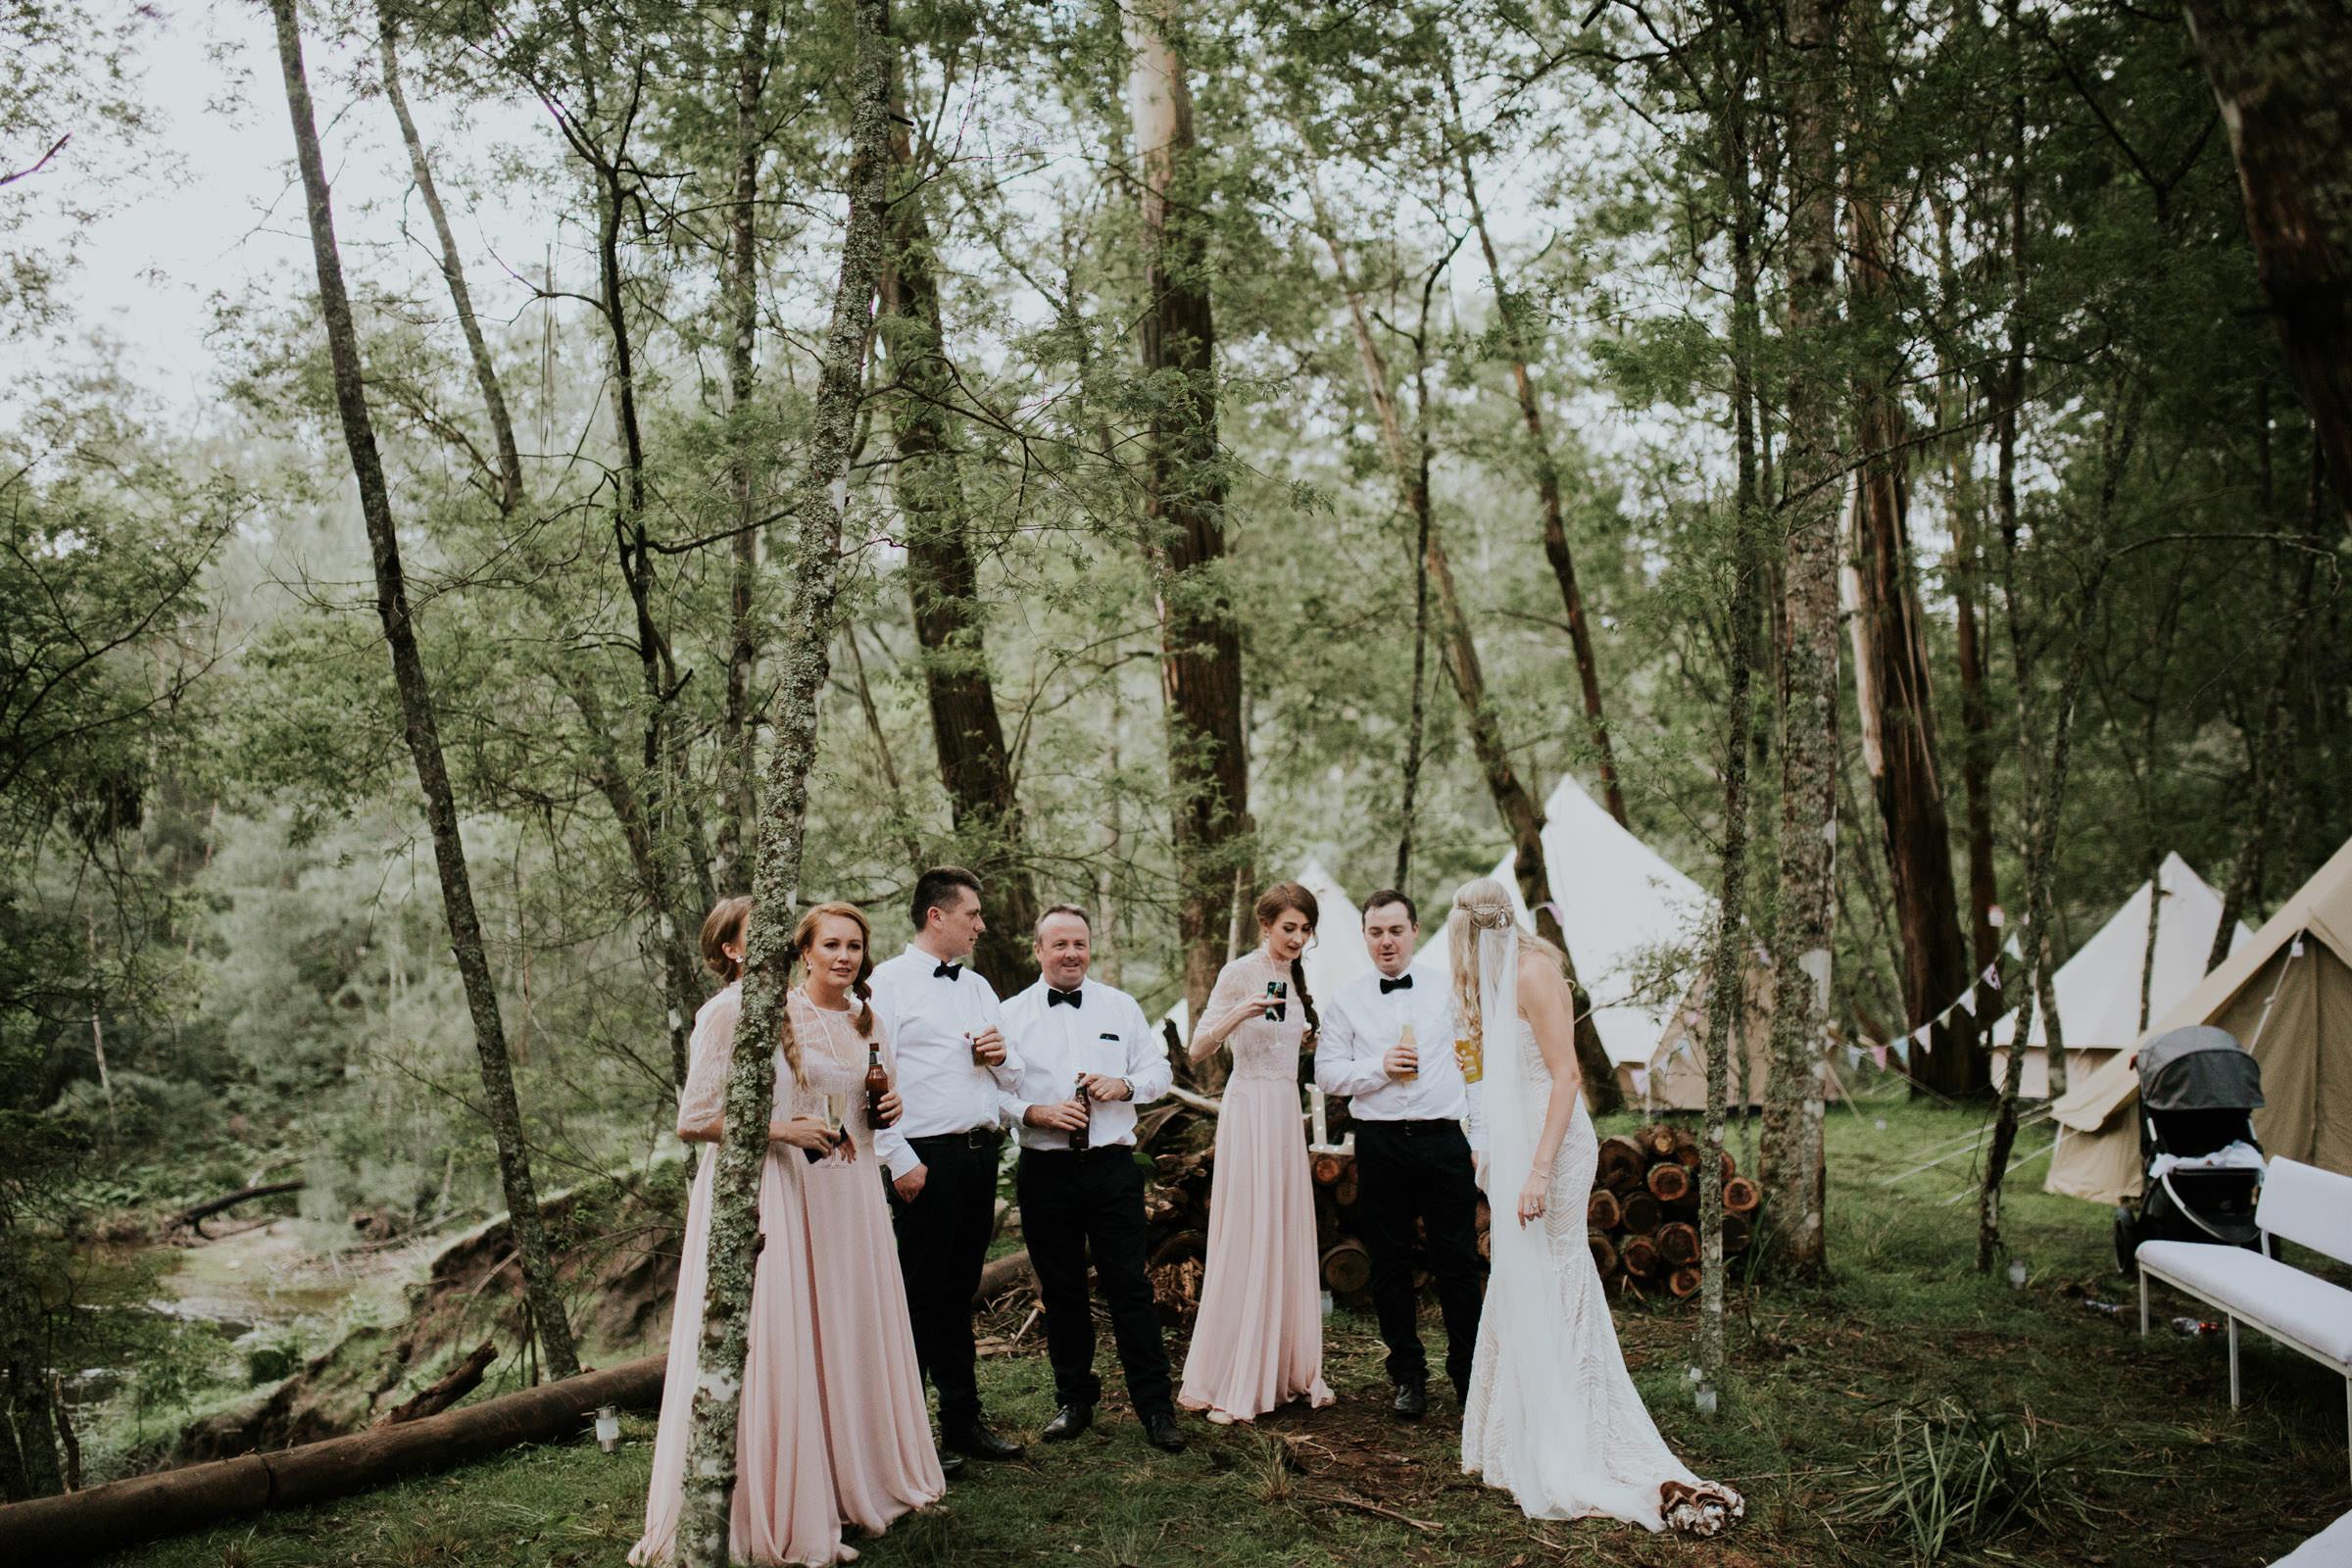 Emma+John+Far+South+Coast+Wedding+Festivl+Glamping+Bush-149.jpg